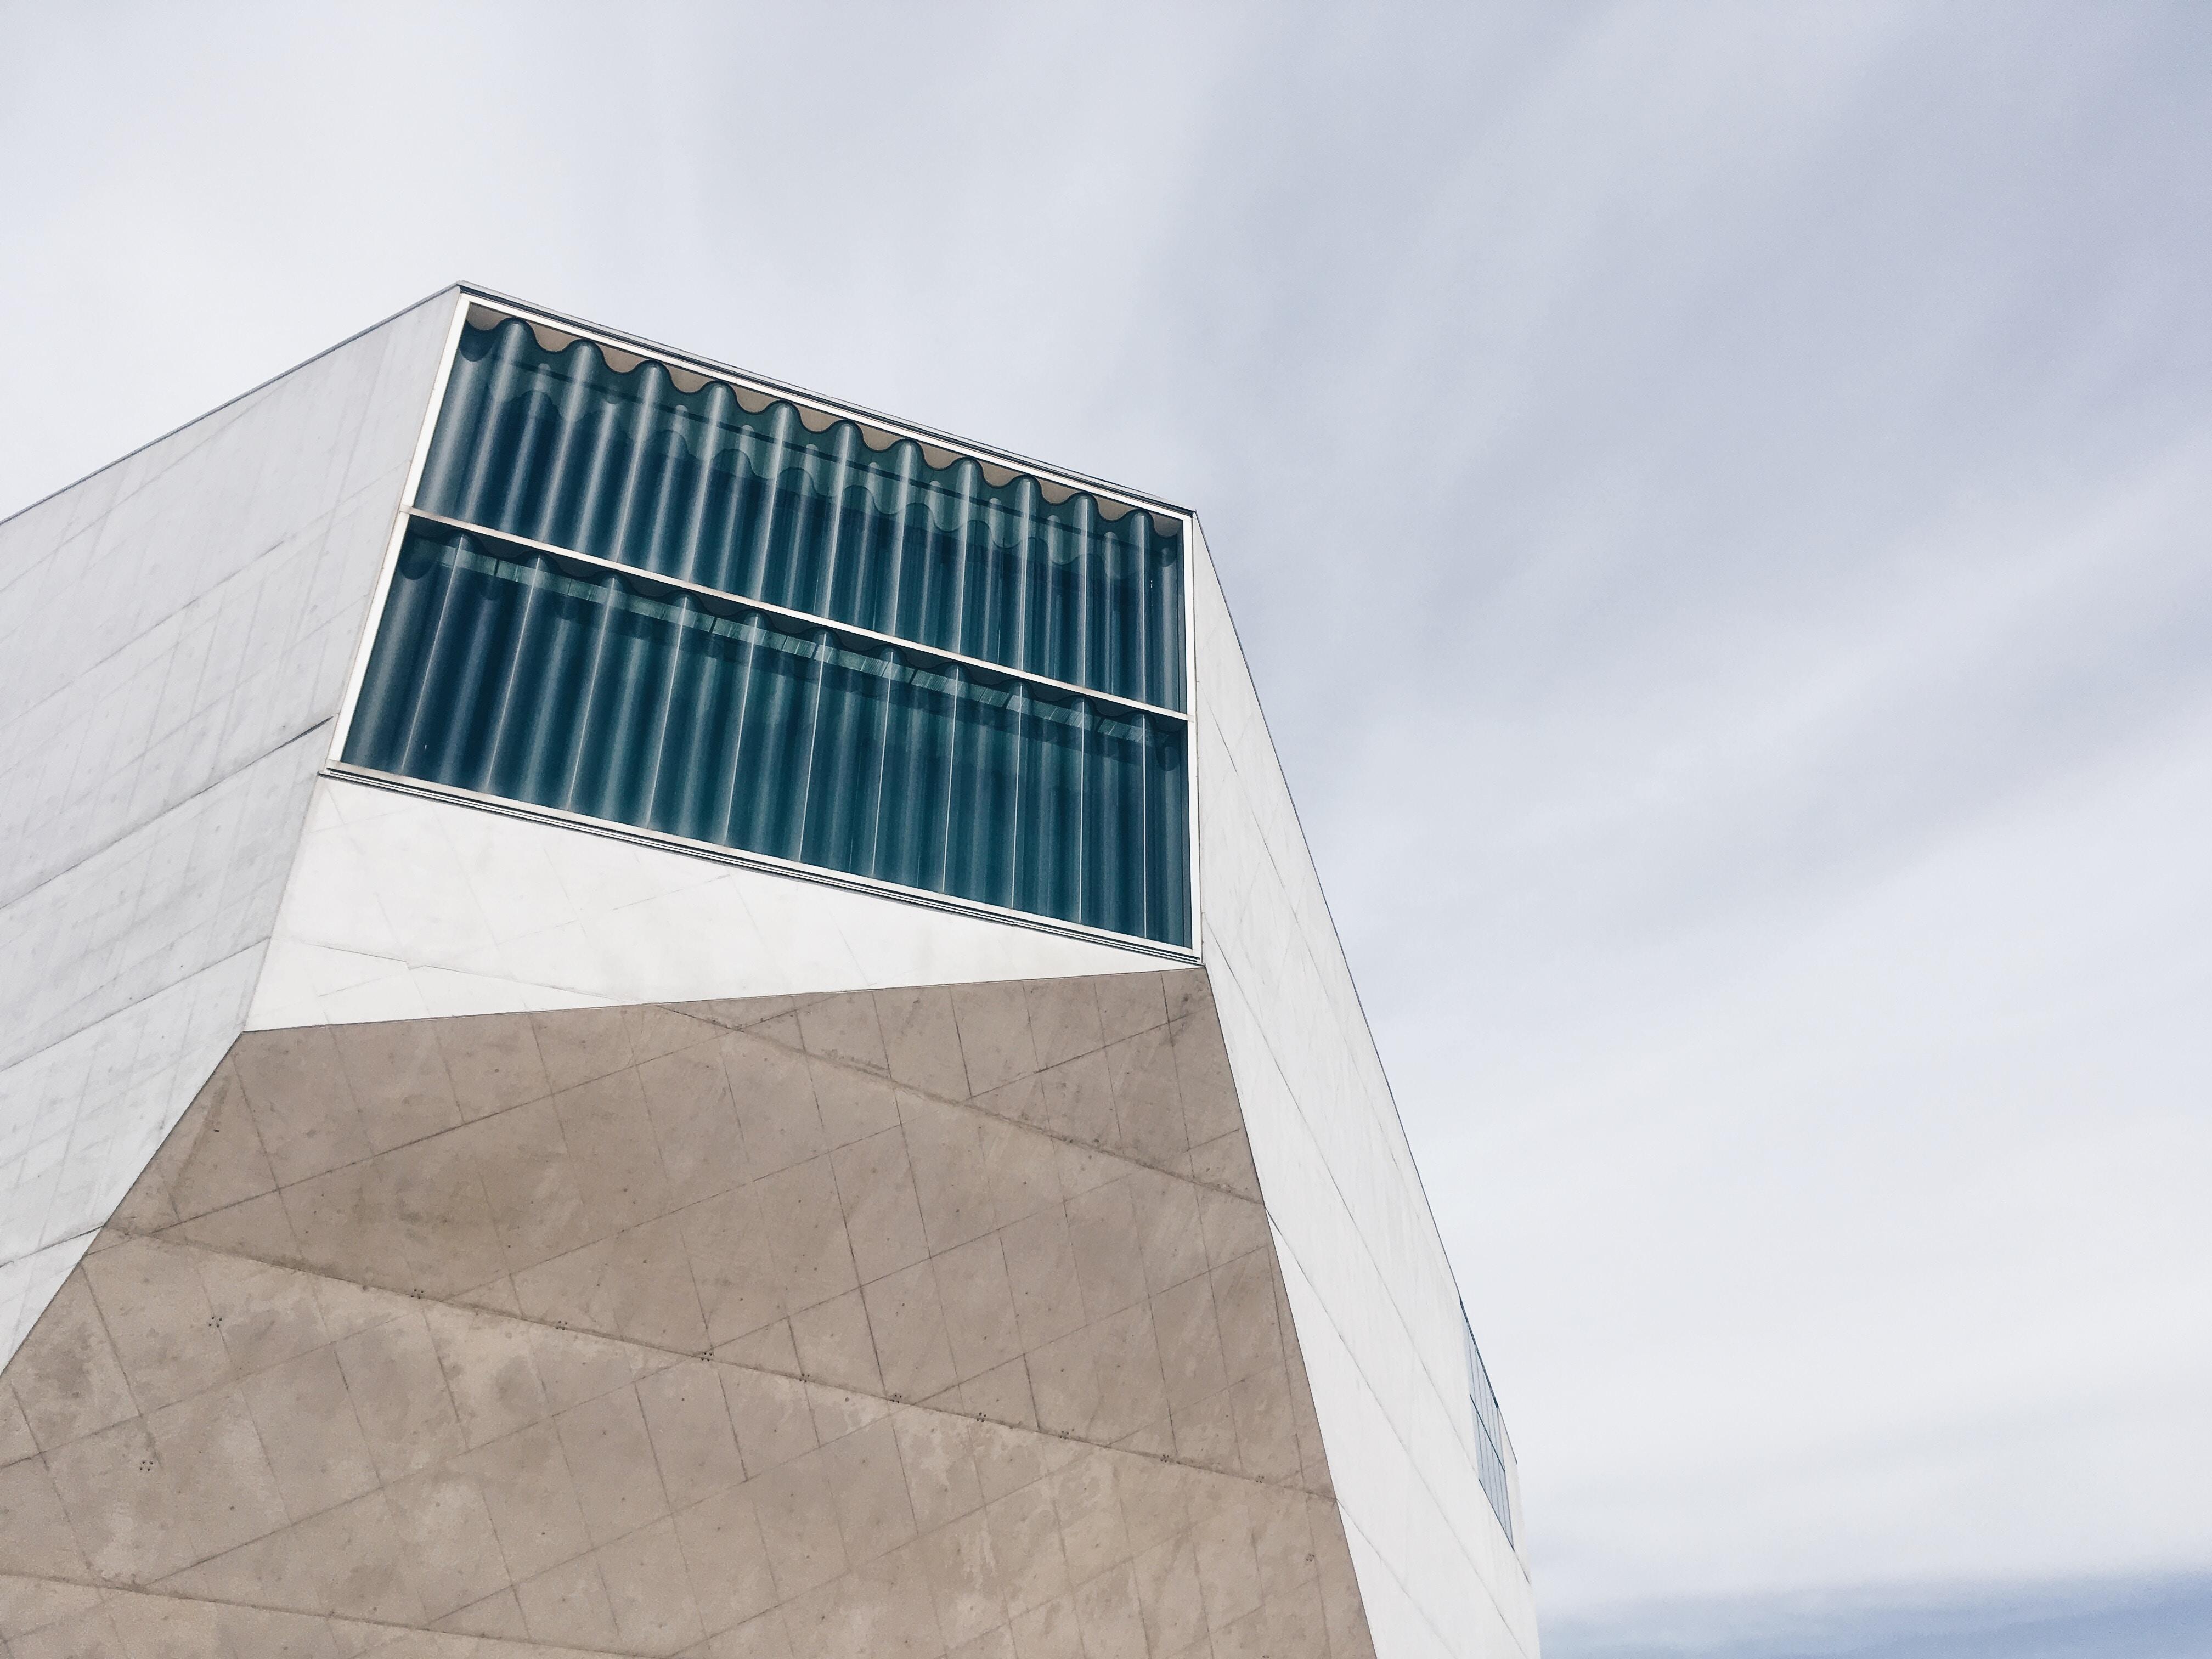 gray concrete building taken under white cloud during daytime